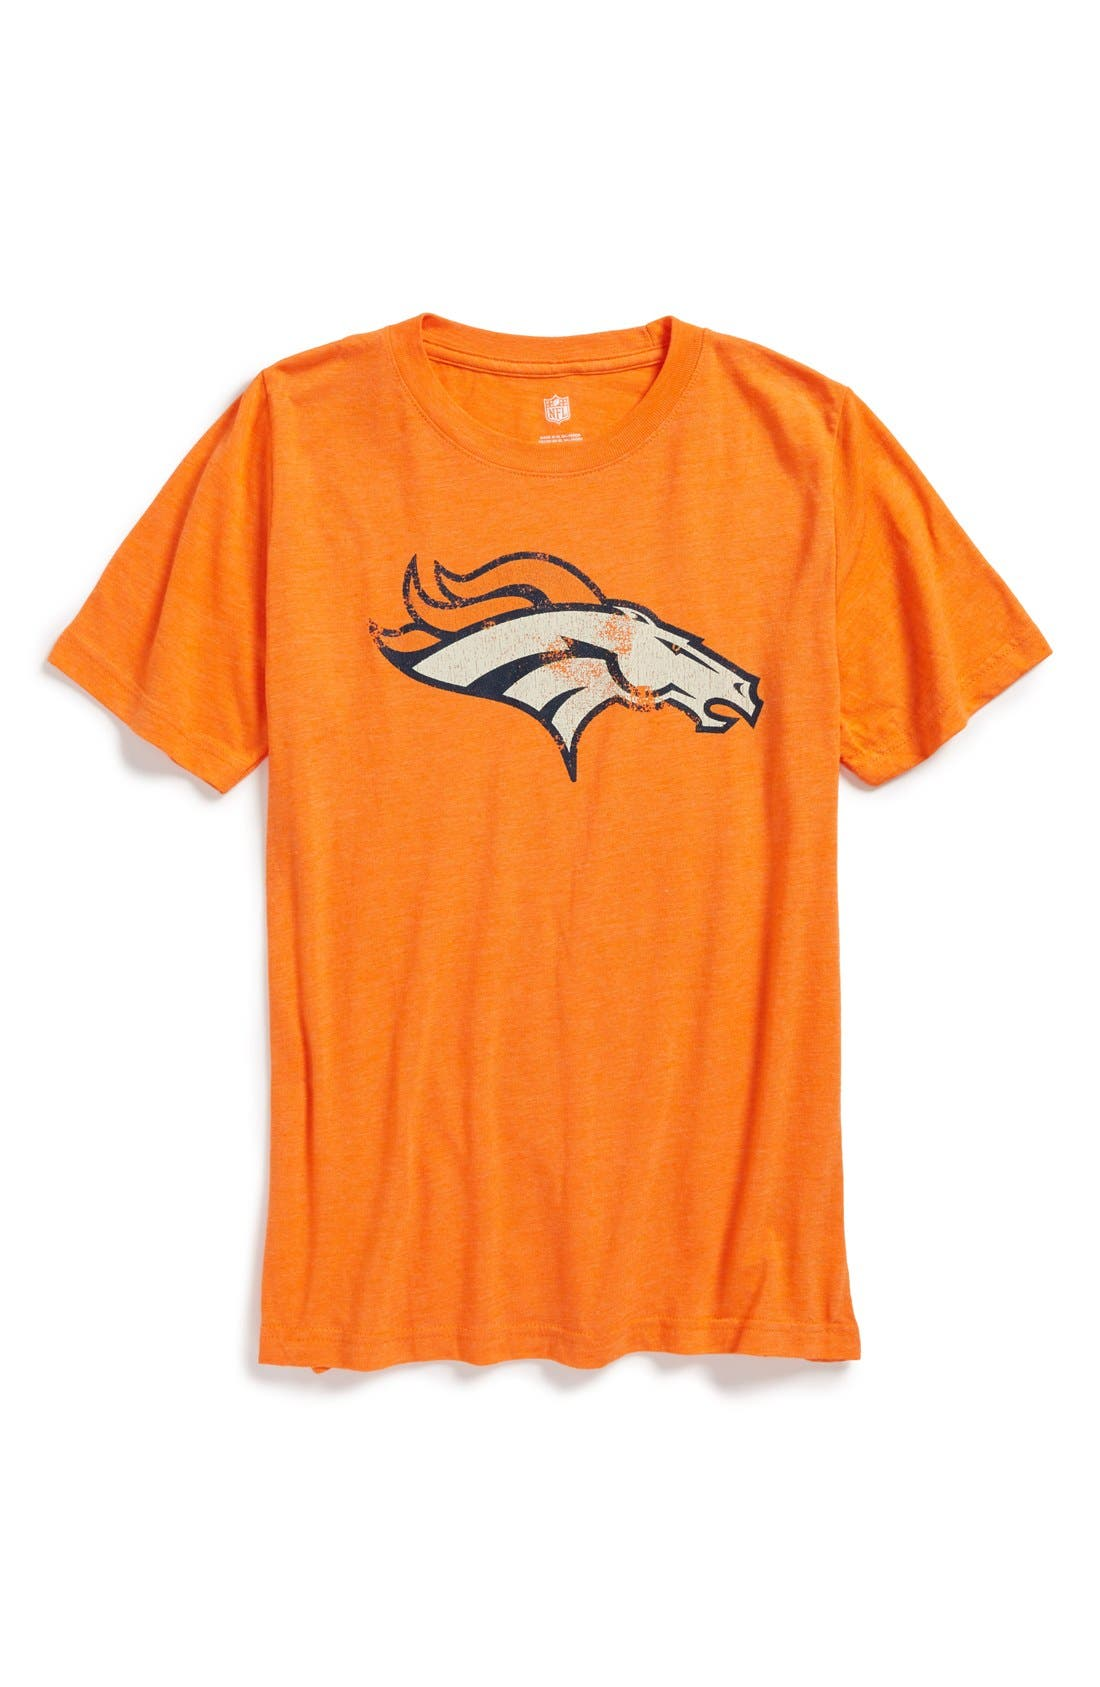 Main Image - Outerstuff 'NFL - Denver Broncos' Graphic T-Shirt (Big Boys)